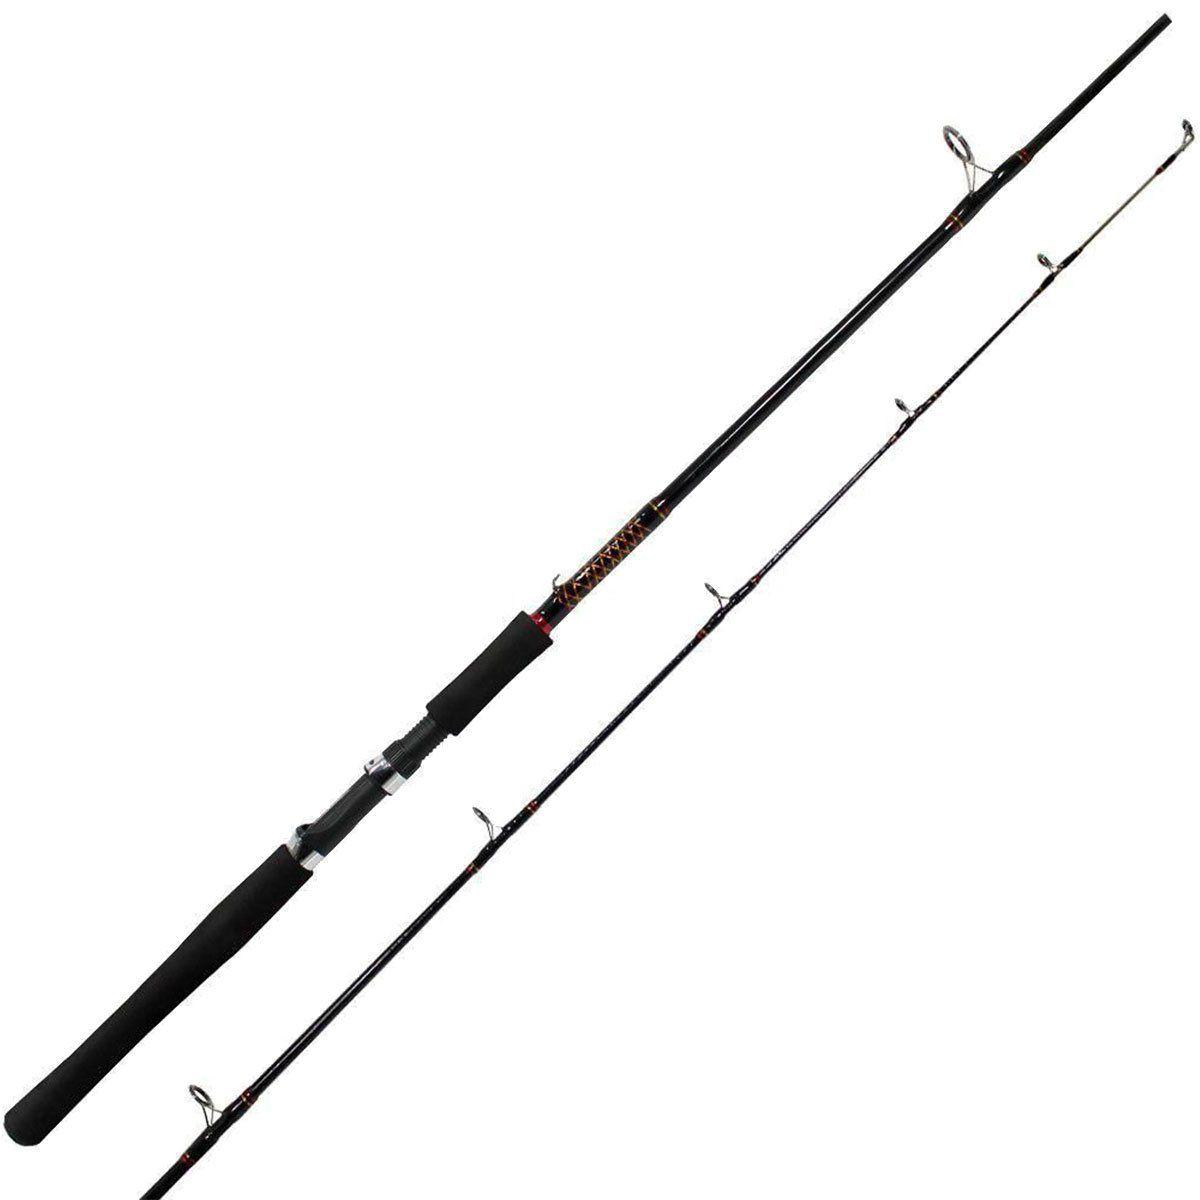 Vara Saint Plus Stick 601-SP Molinete 1,80m 5? 9?? 20-40lb